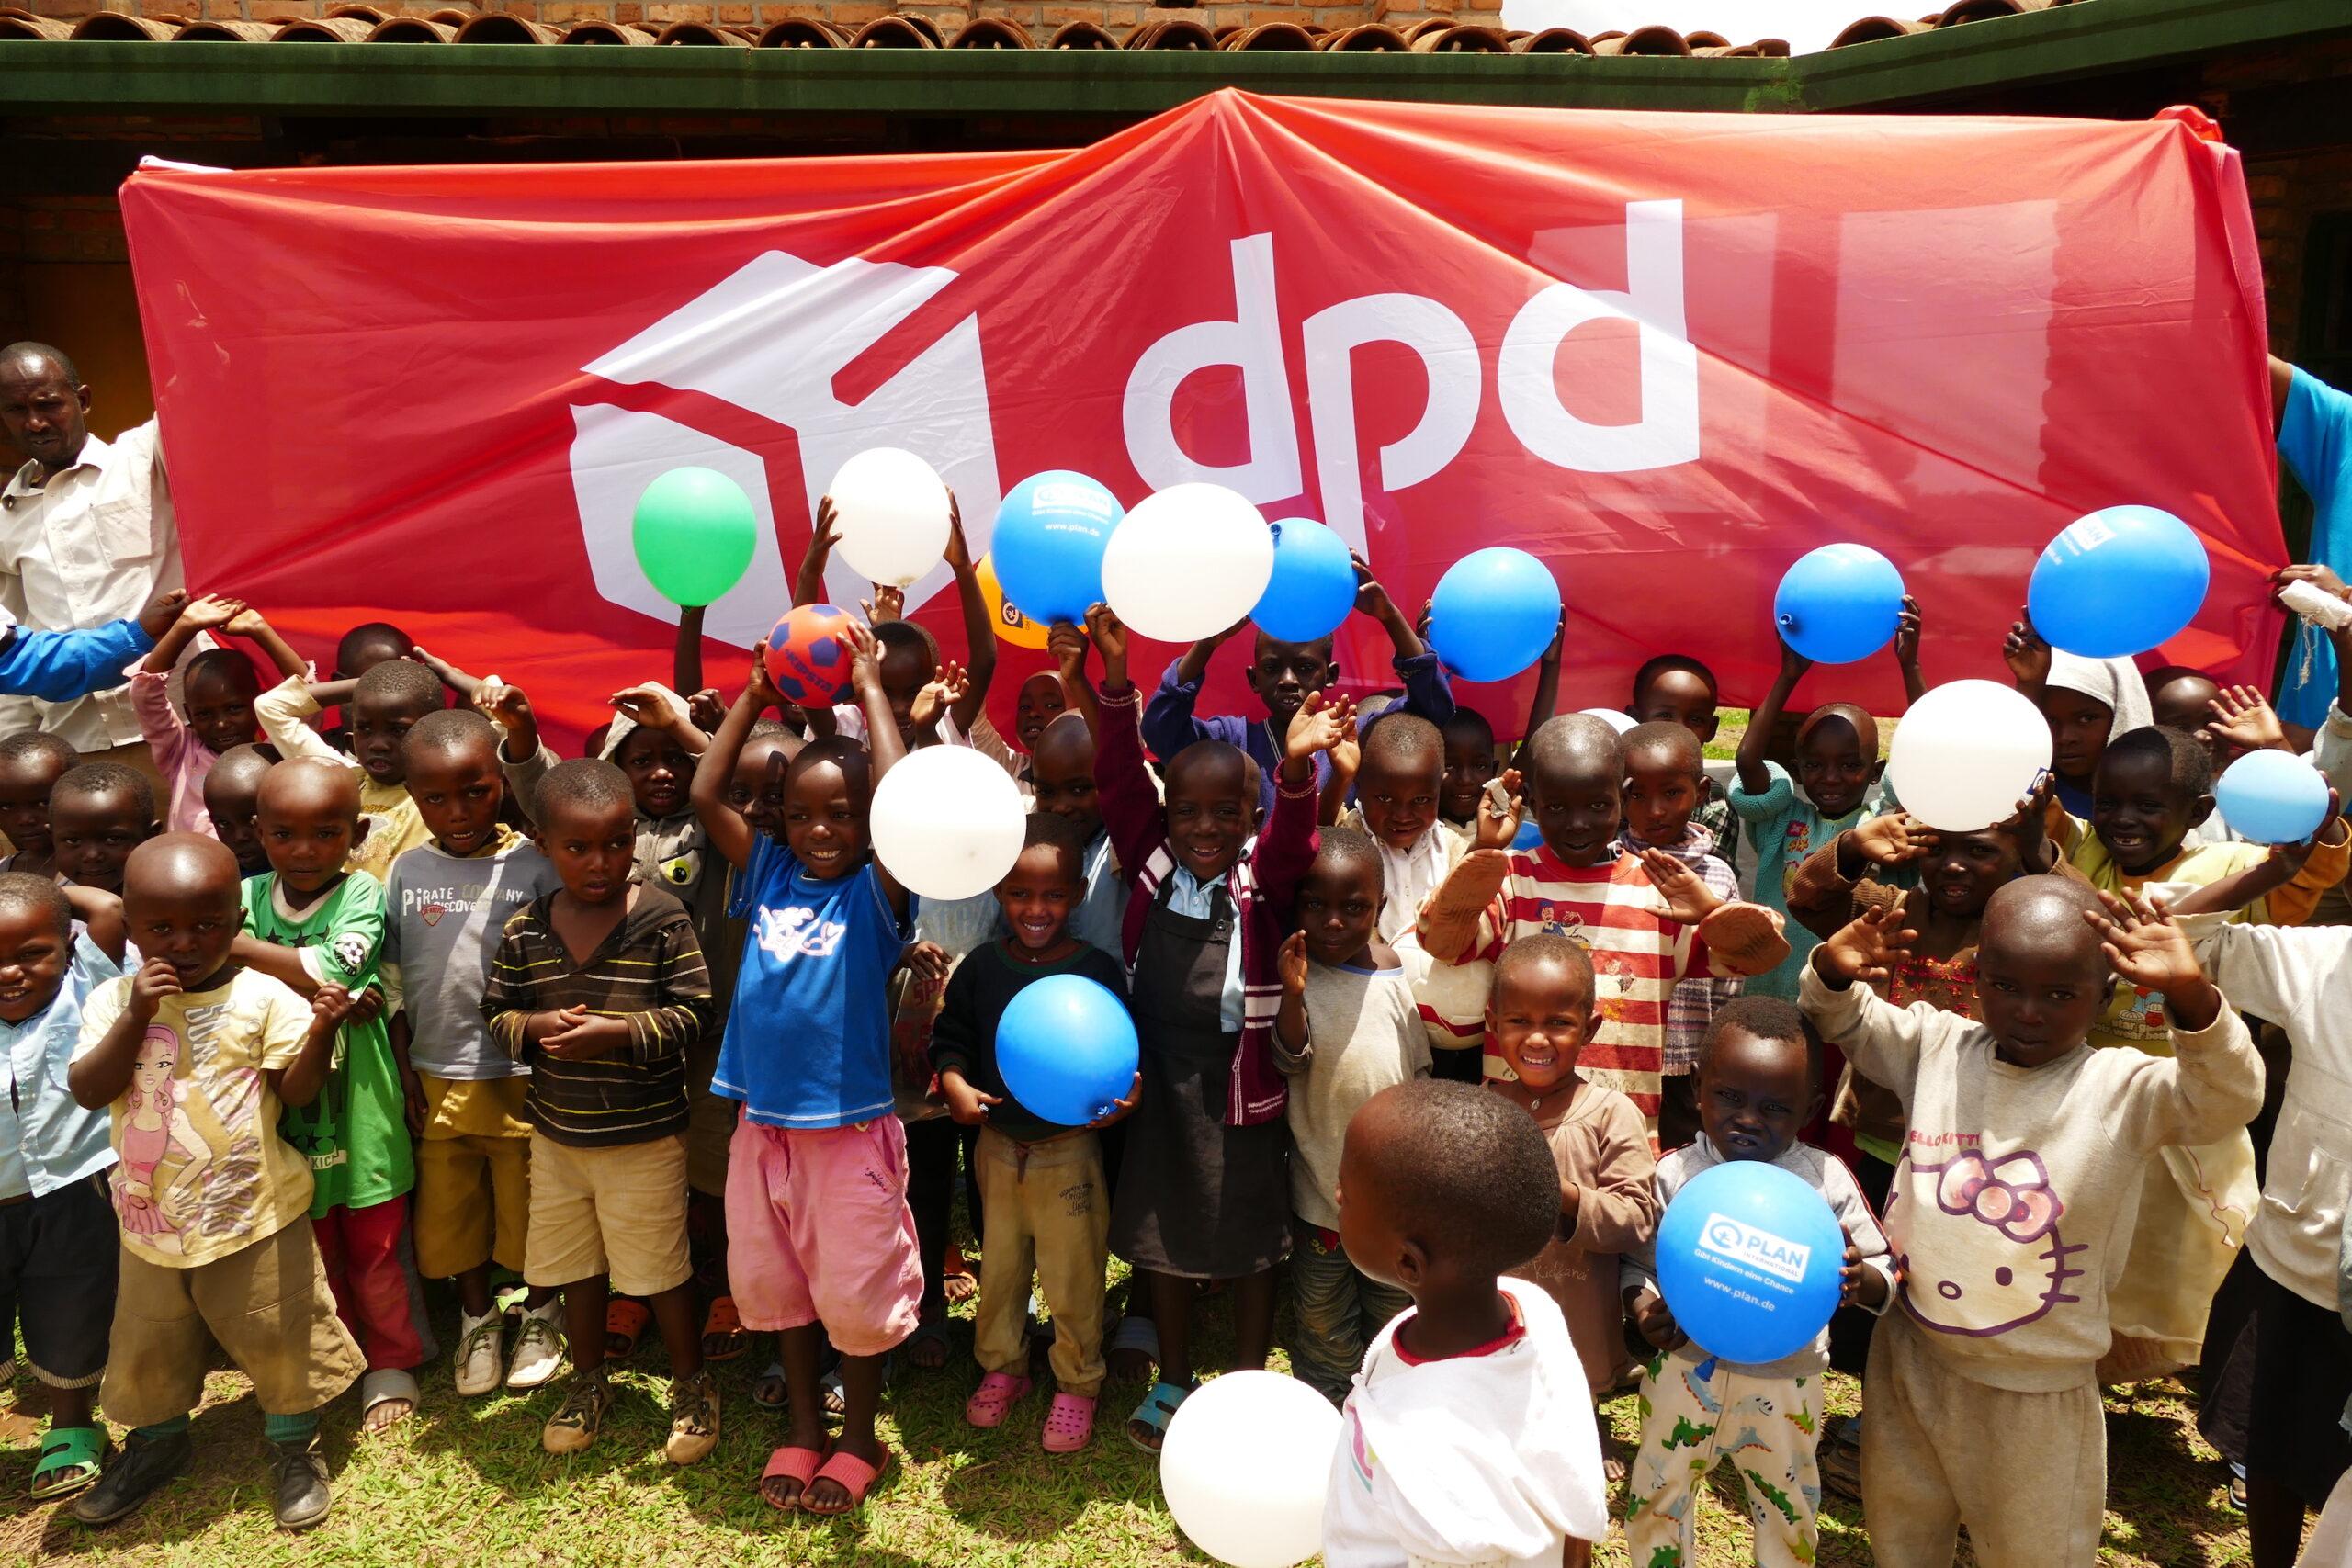 DPD-children_Stiftung-Hilfe-mti-Plan_Kathrin-Hartkopf-1